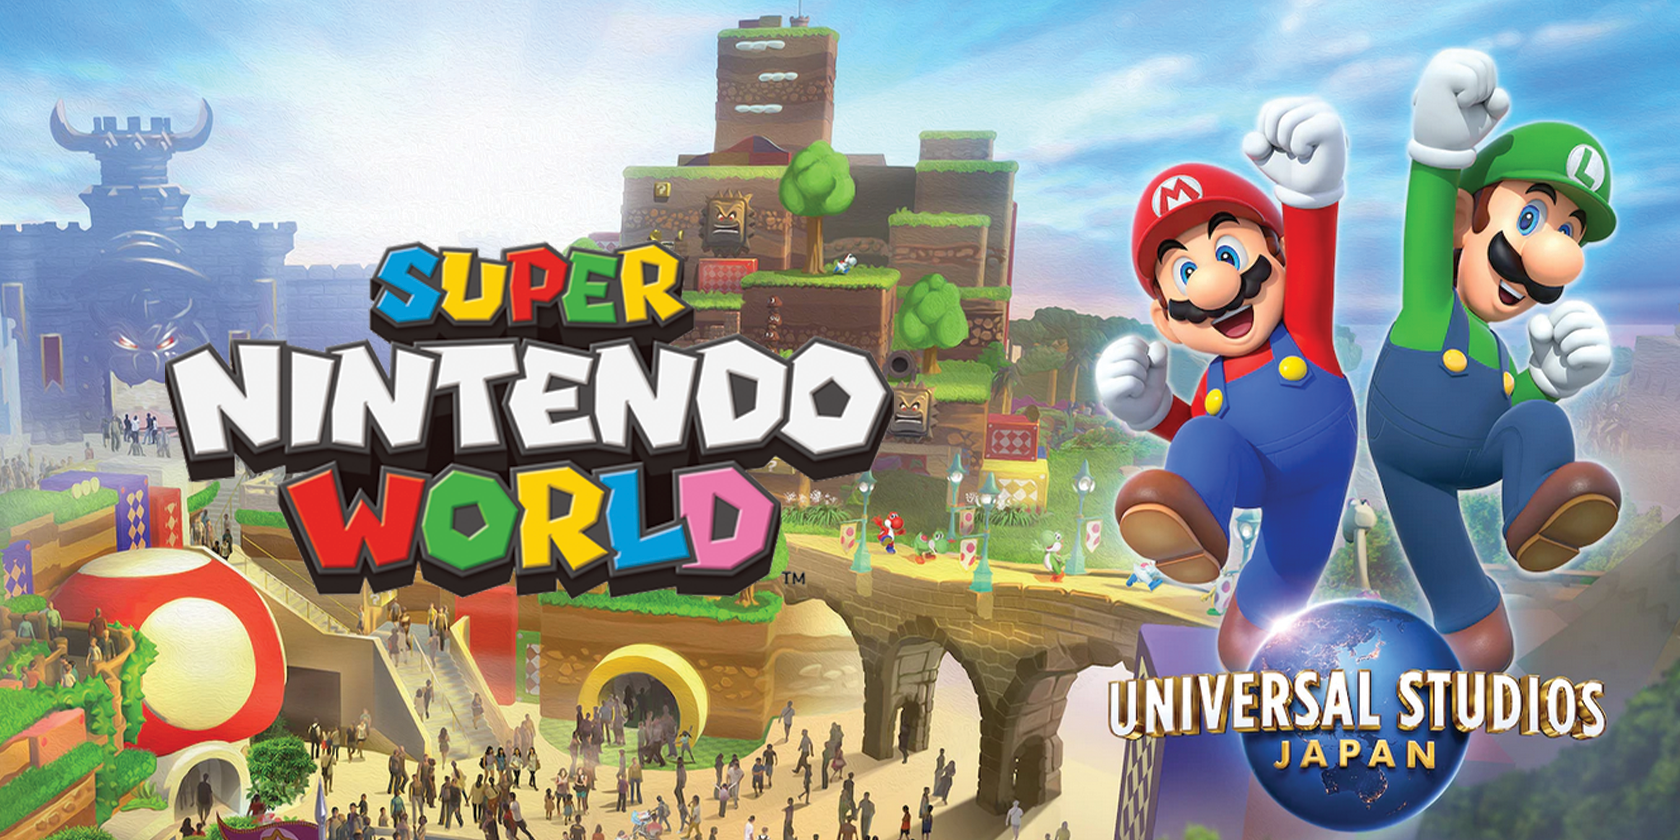 Nintendo Offers a First Look at Super Nintendo World